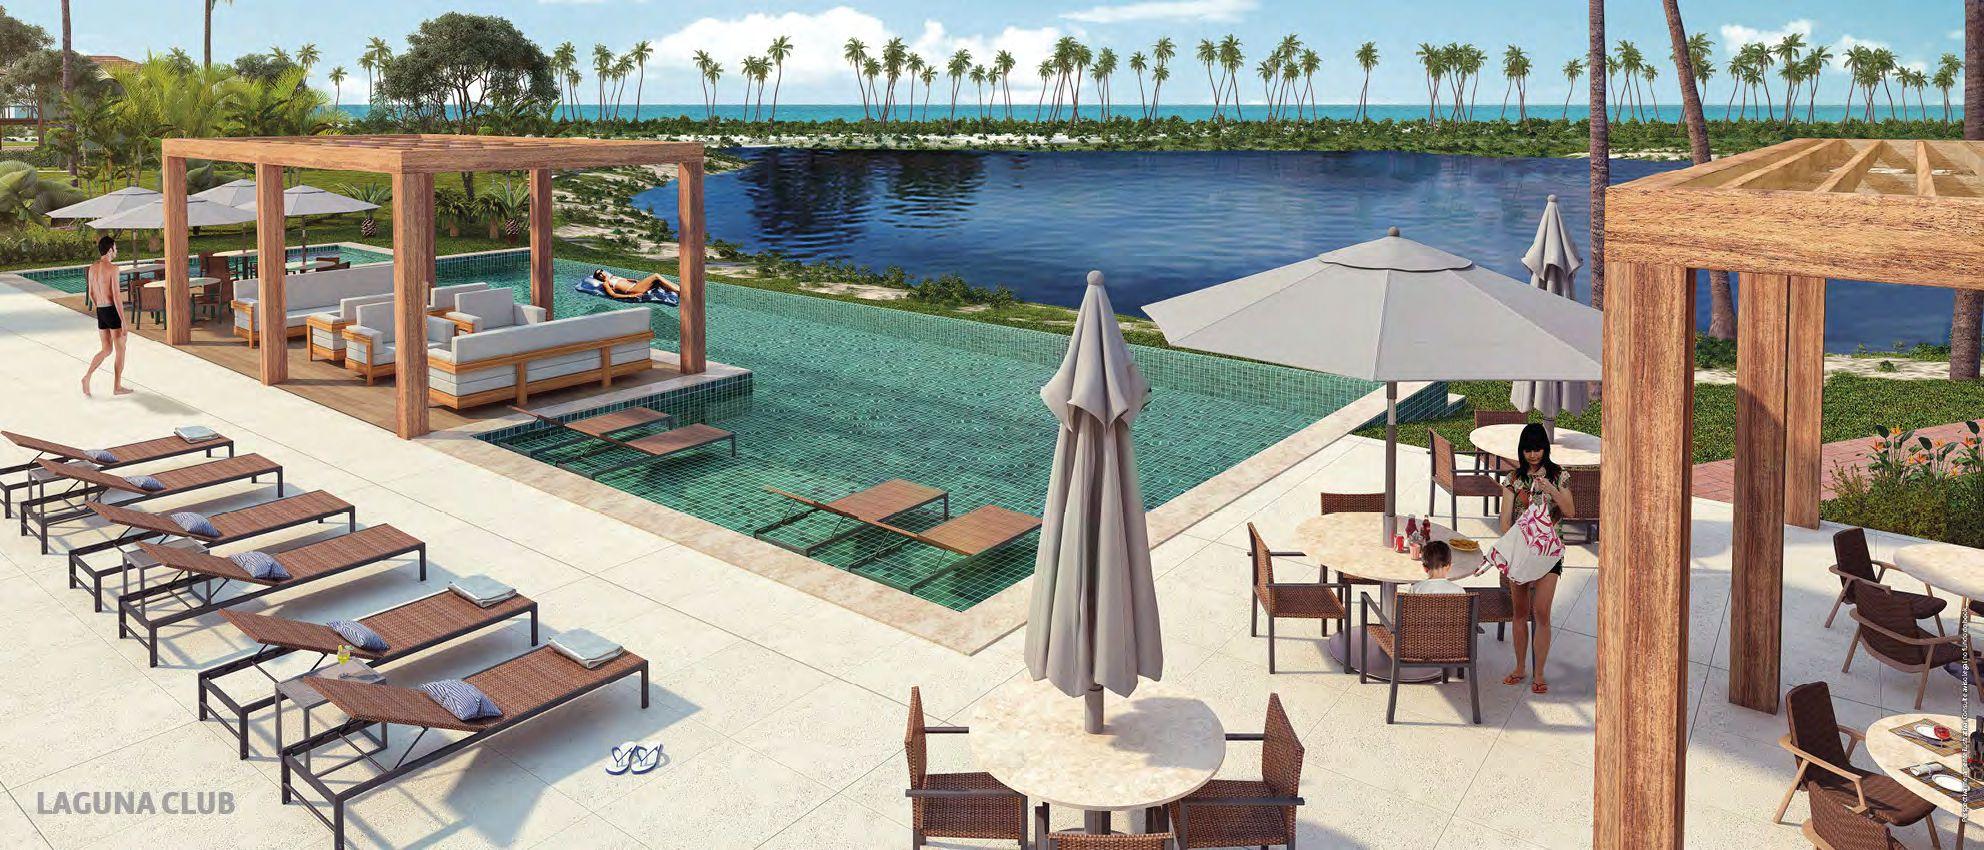 Perspectiva da piscina da Laguna Clube do Condomínio Reserva Sauípe